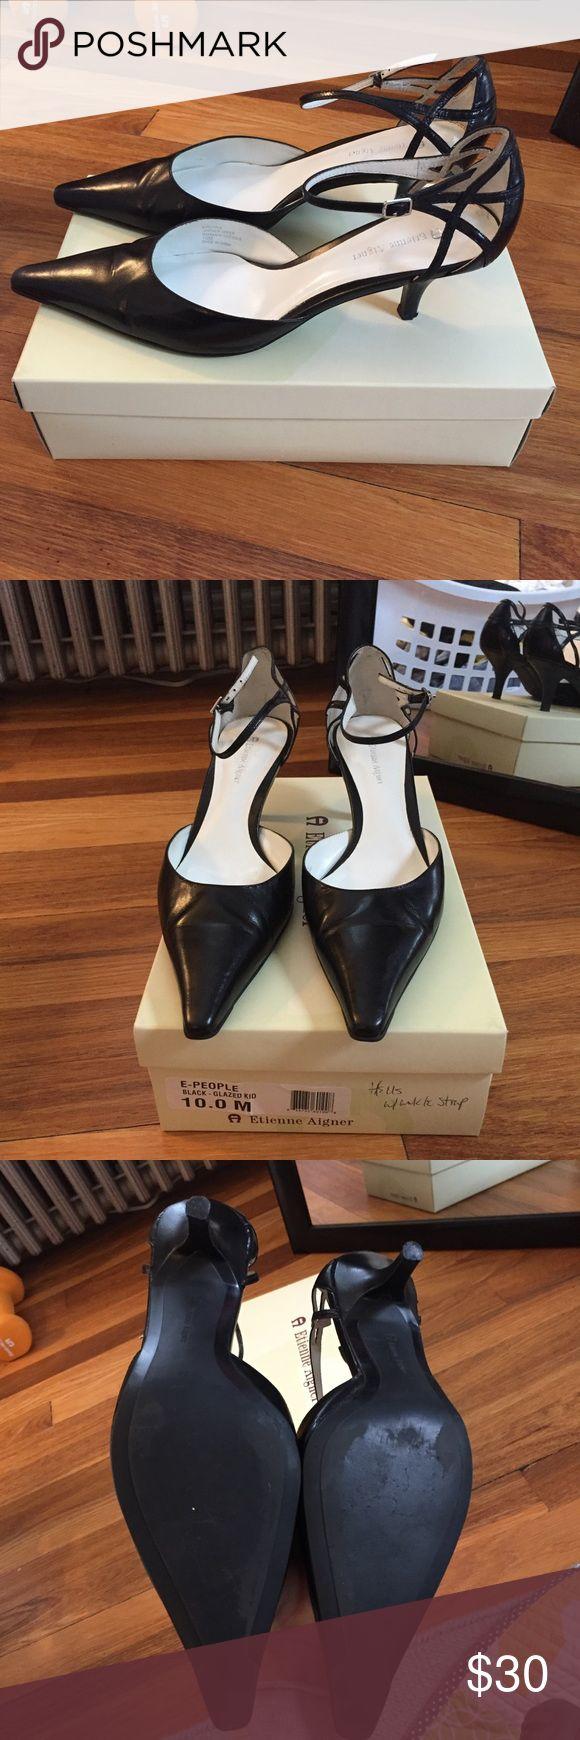 Etienne aigner black leather gloves - Euc Etienne Aigner Heels With Ankle Strap Etienne Aignerleather Upperblack